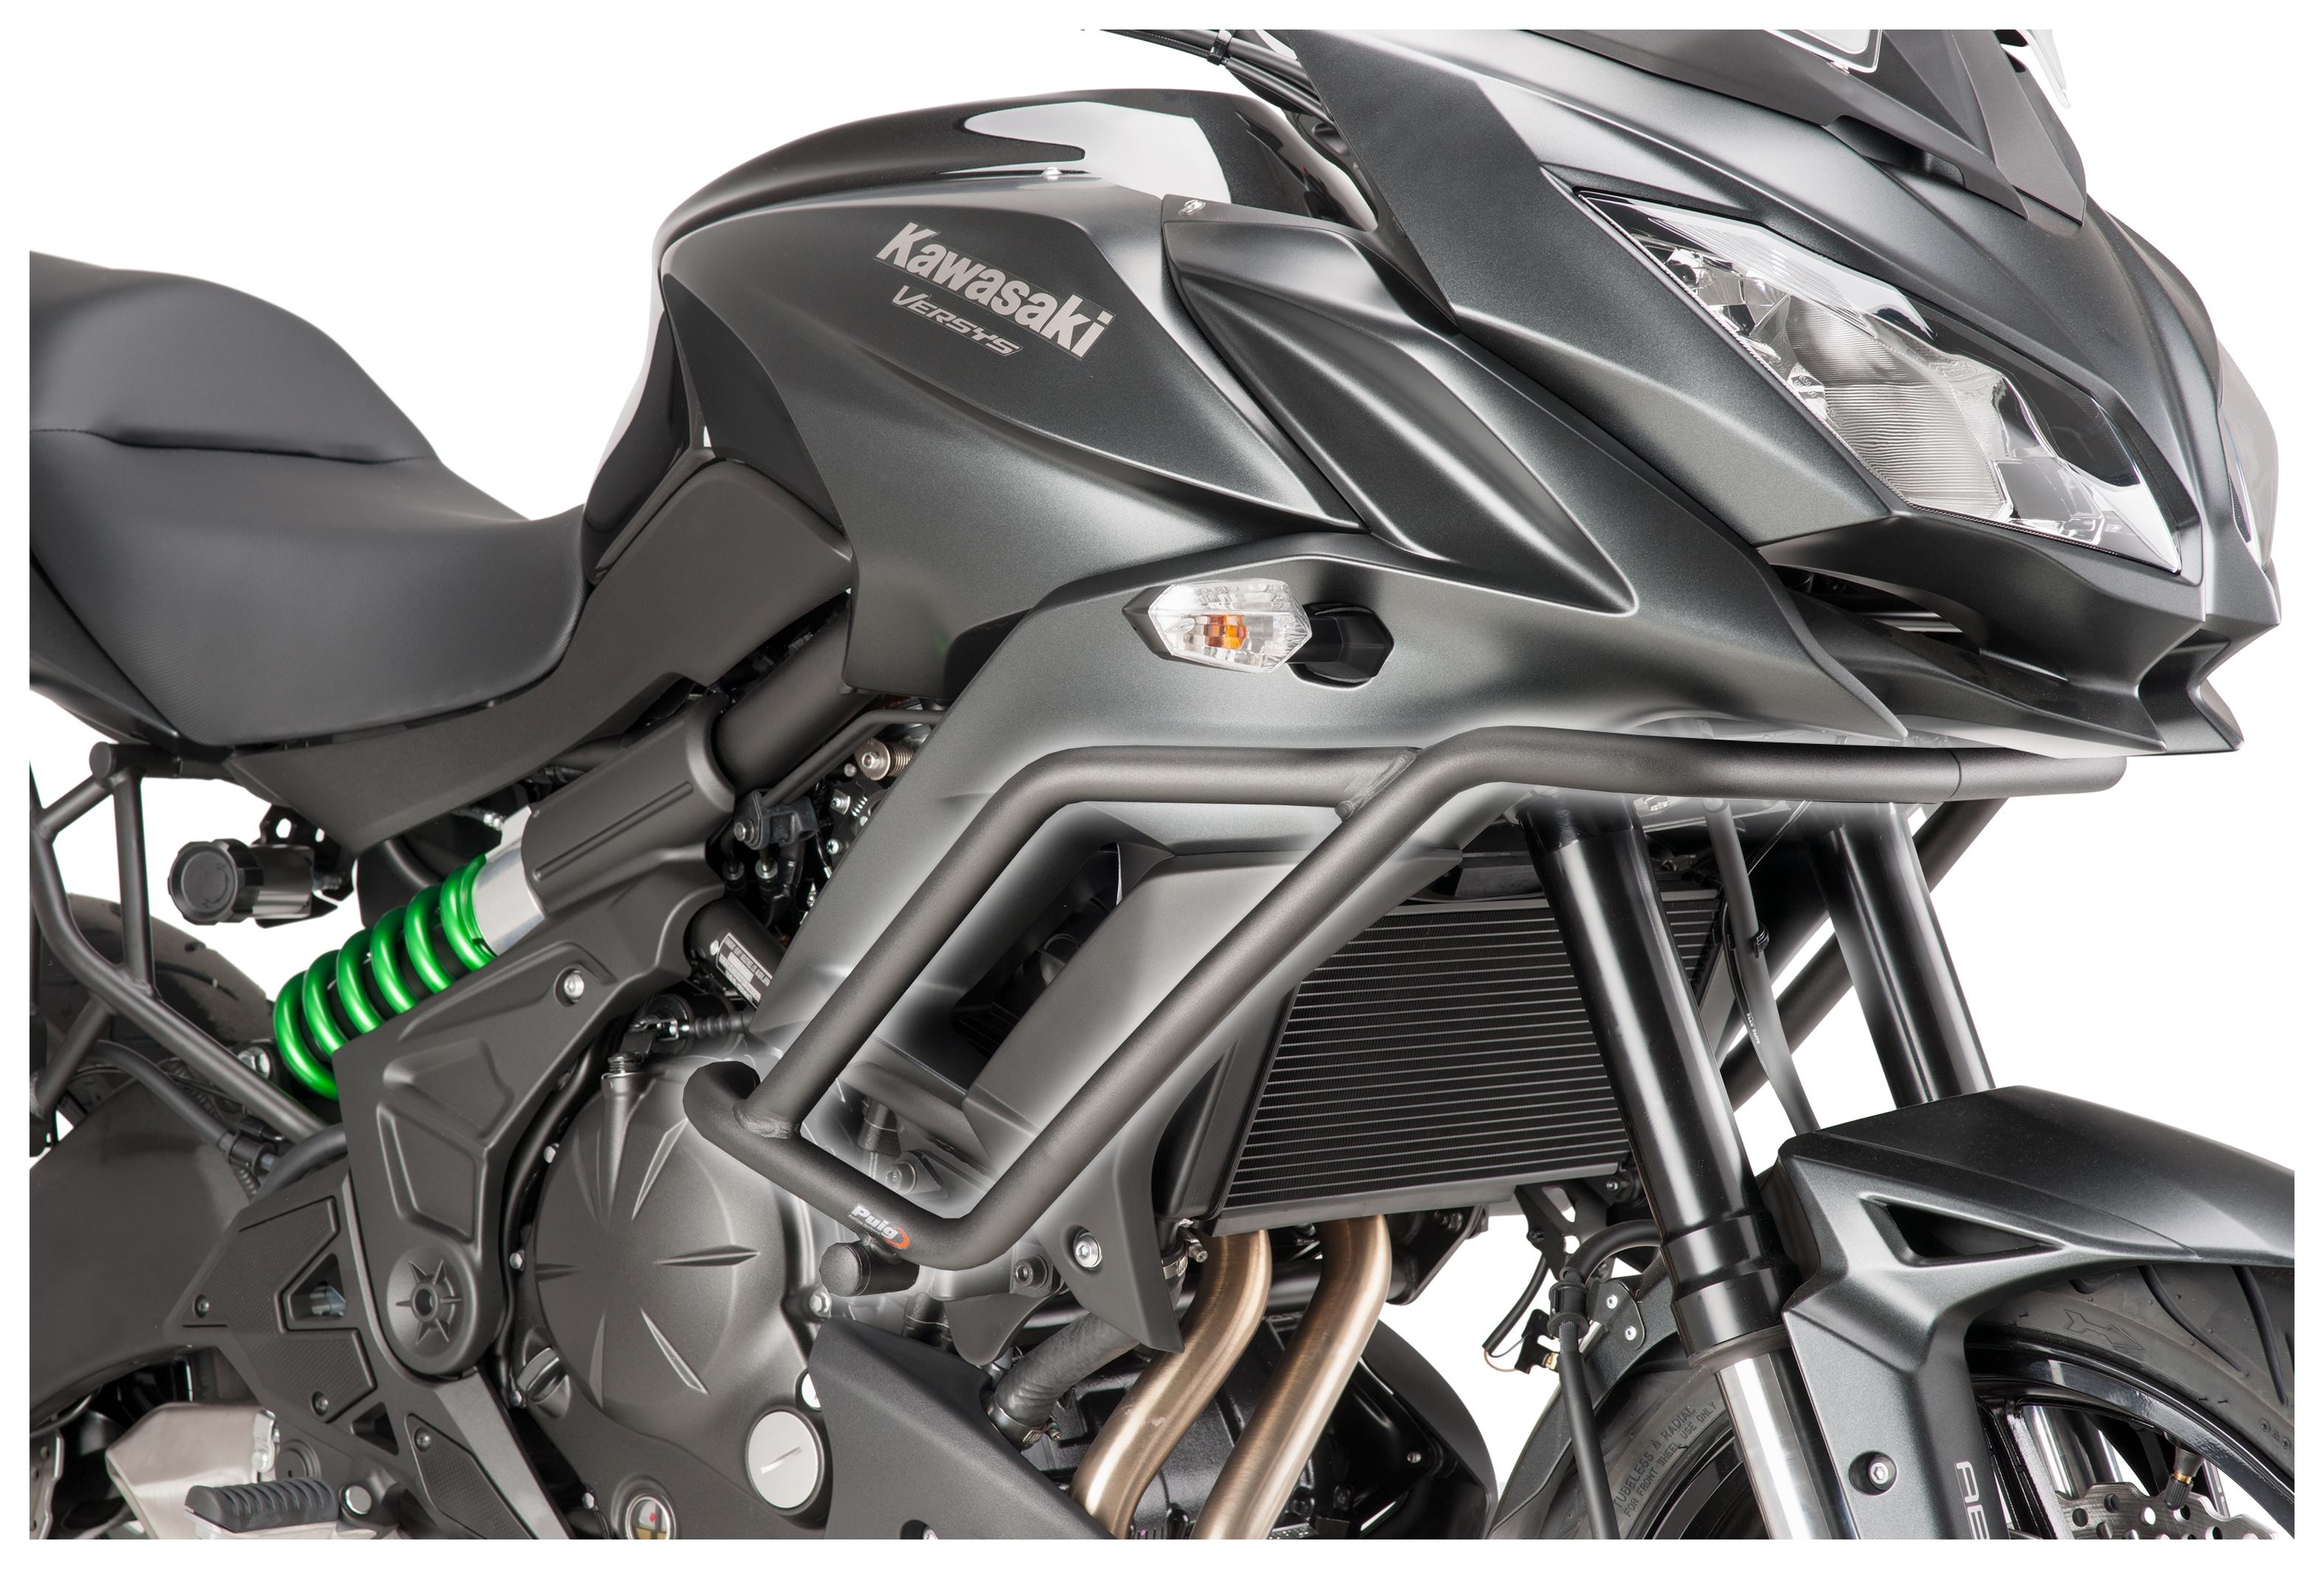 Lower Crash Bar Engine Guard Bumper Fit for Kawasaki KLE650 Versys 650 15-20 CHENDGE2 Upper